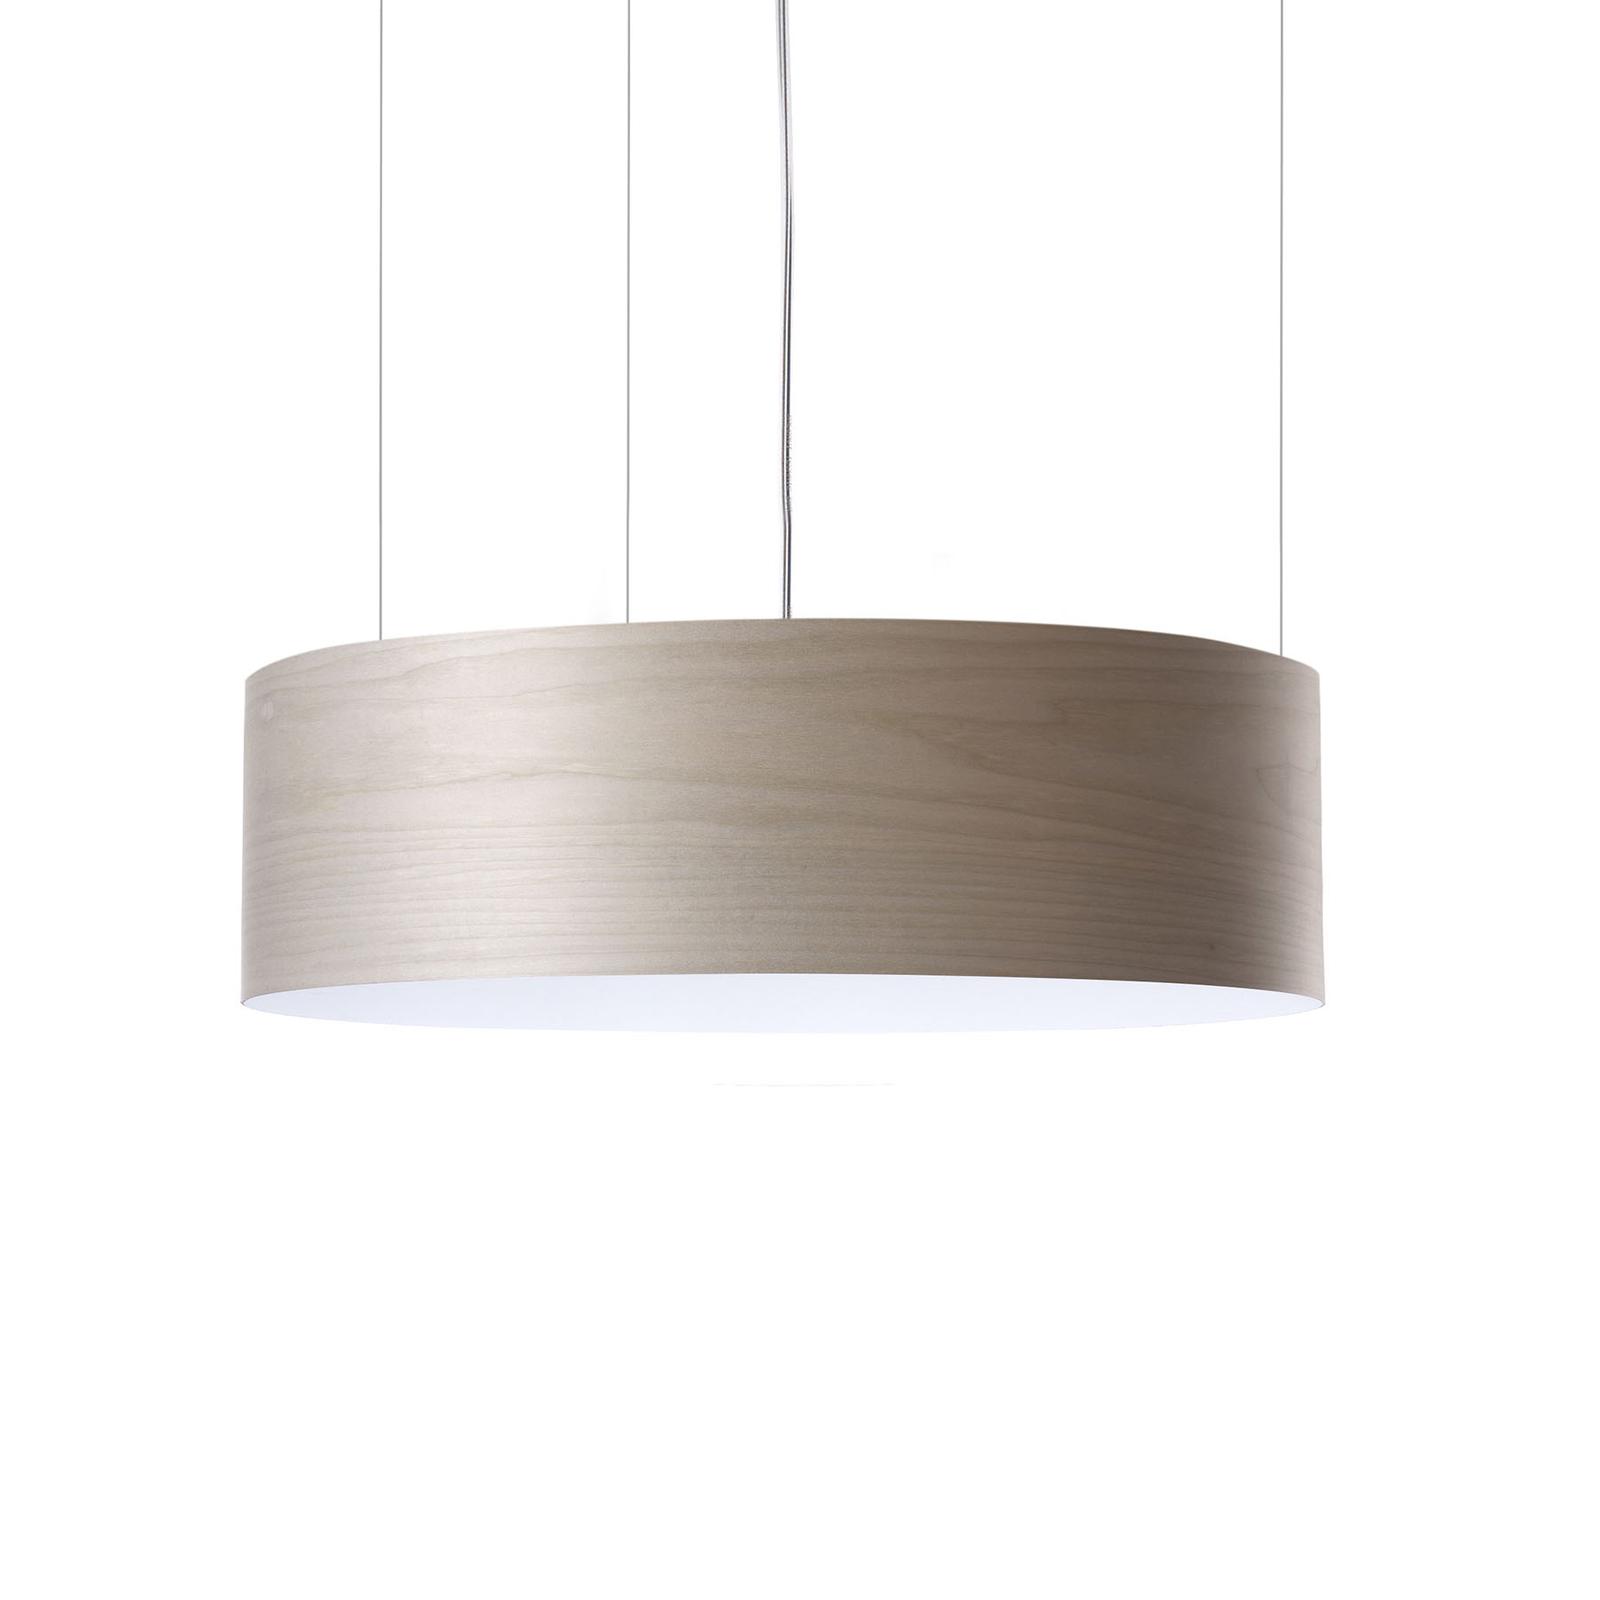 LZF Gea Slim LED-hengelampe Casambi dim grå